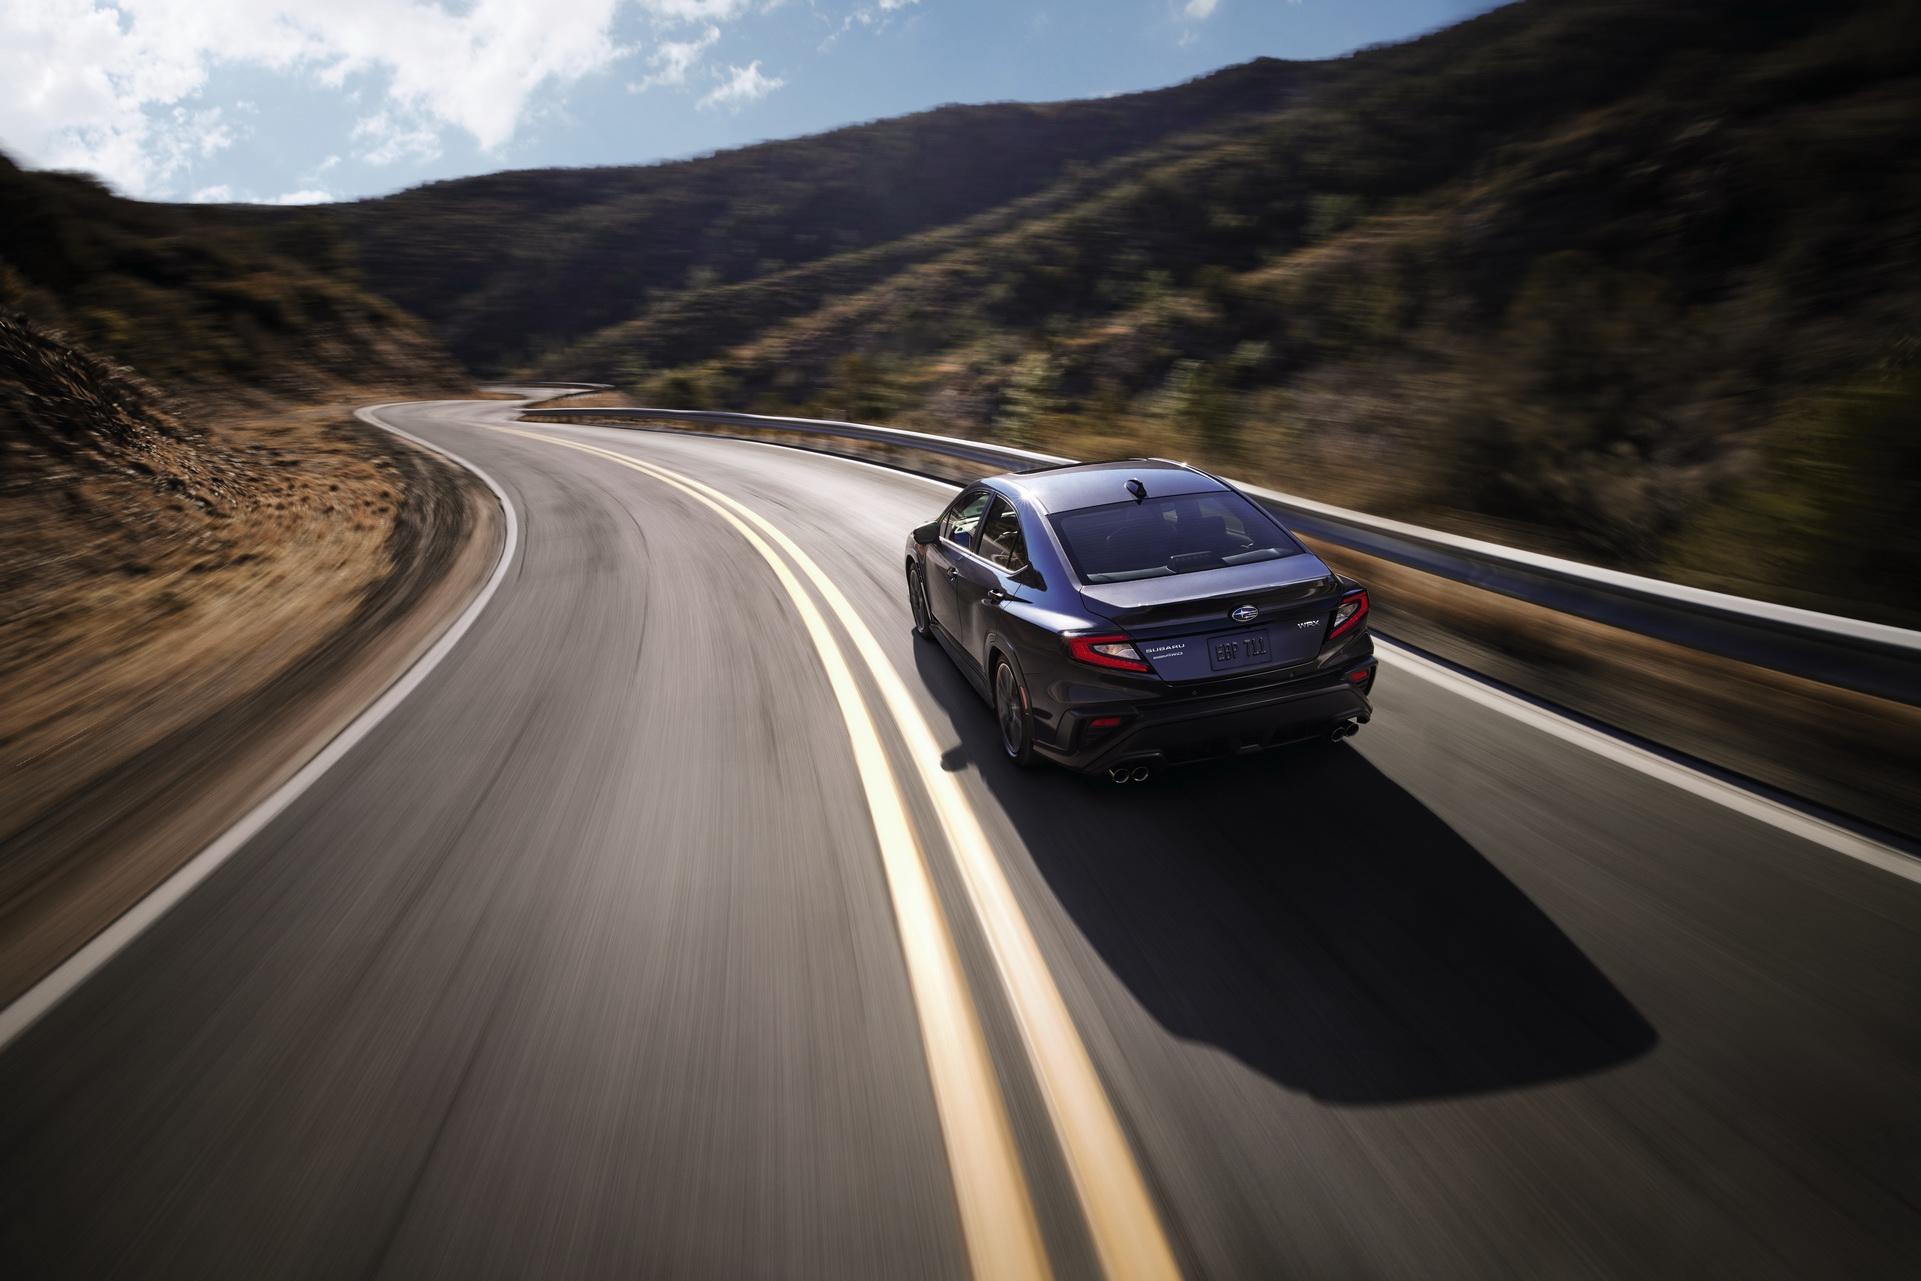 2022 Subaru WRX Rear Wallpapers #39 of 61